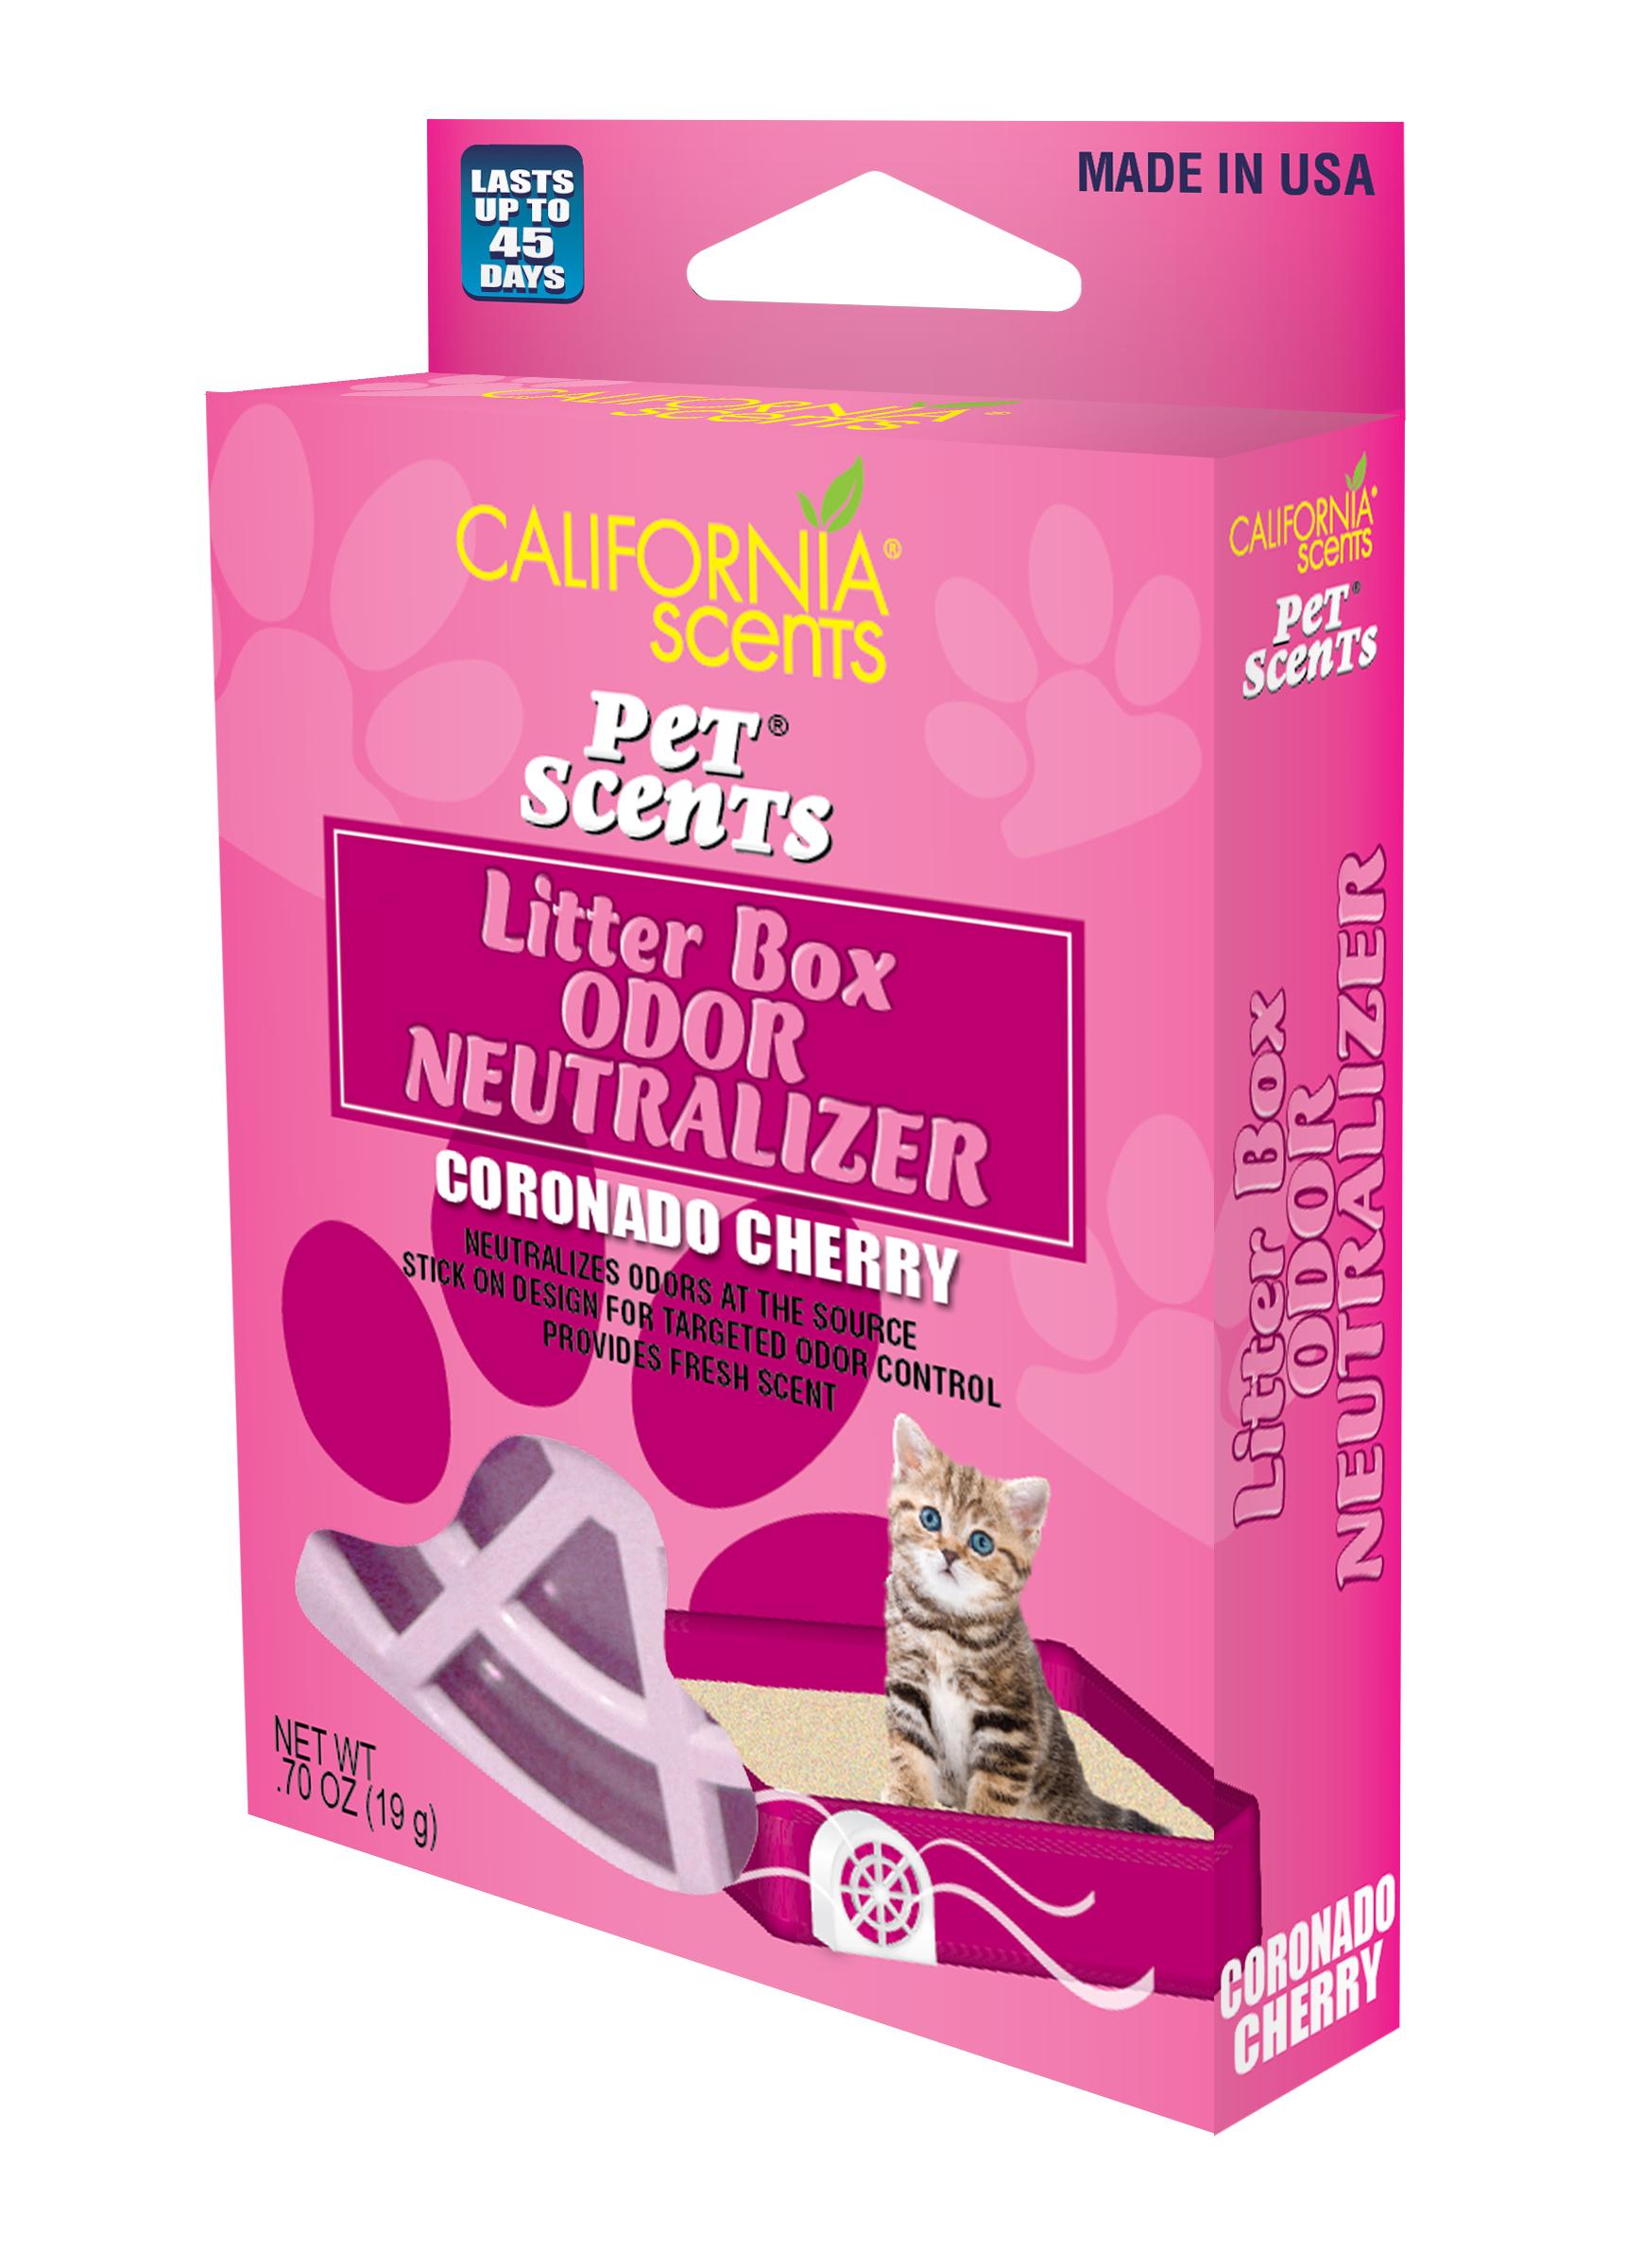 Pet Scents Litter Fresh - Coronado Cherry HiRes 10-03-11.jpg